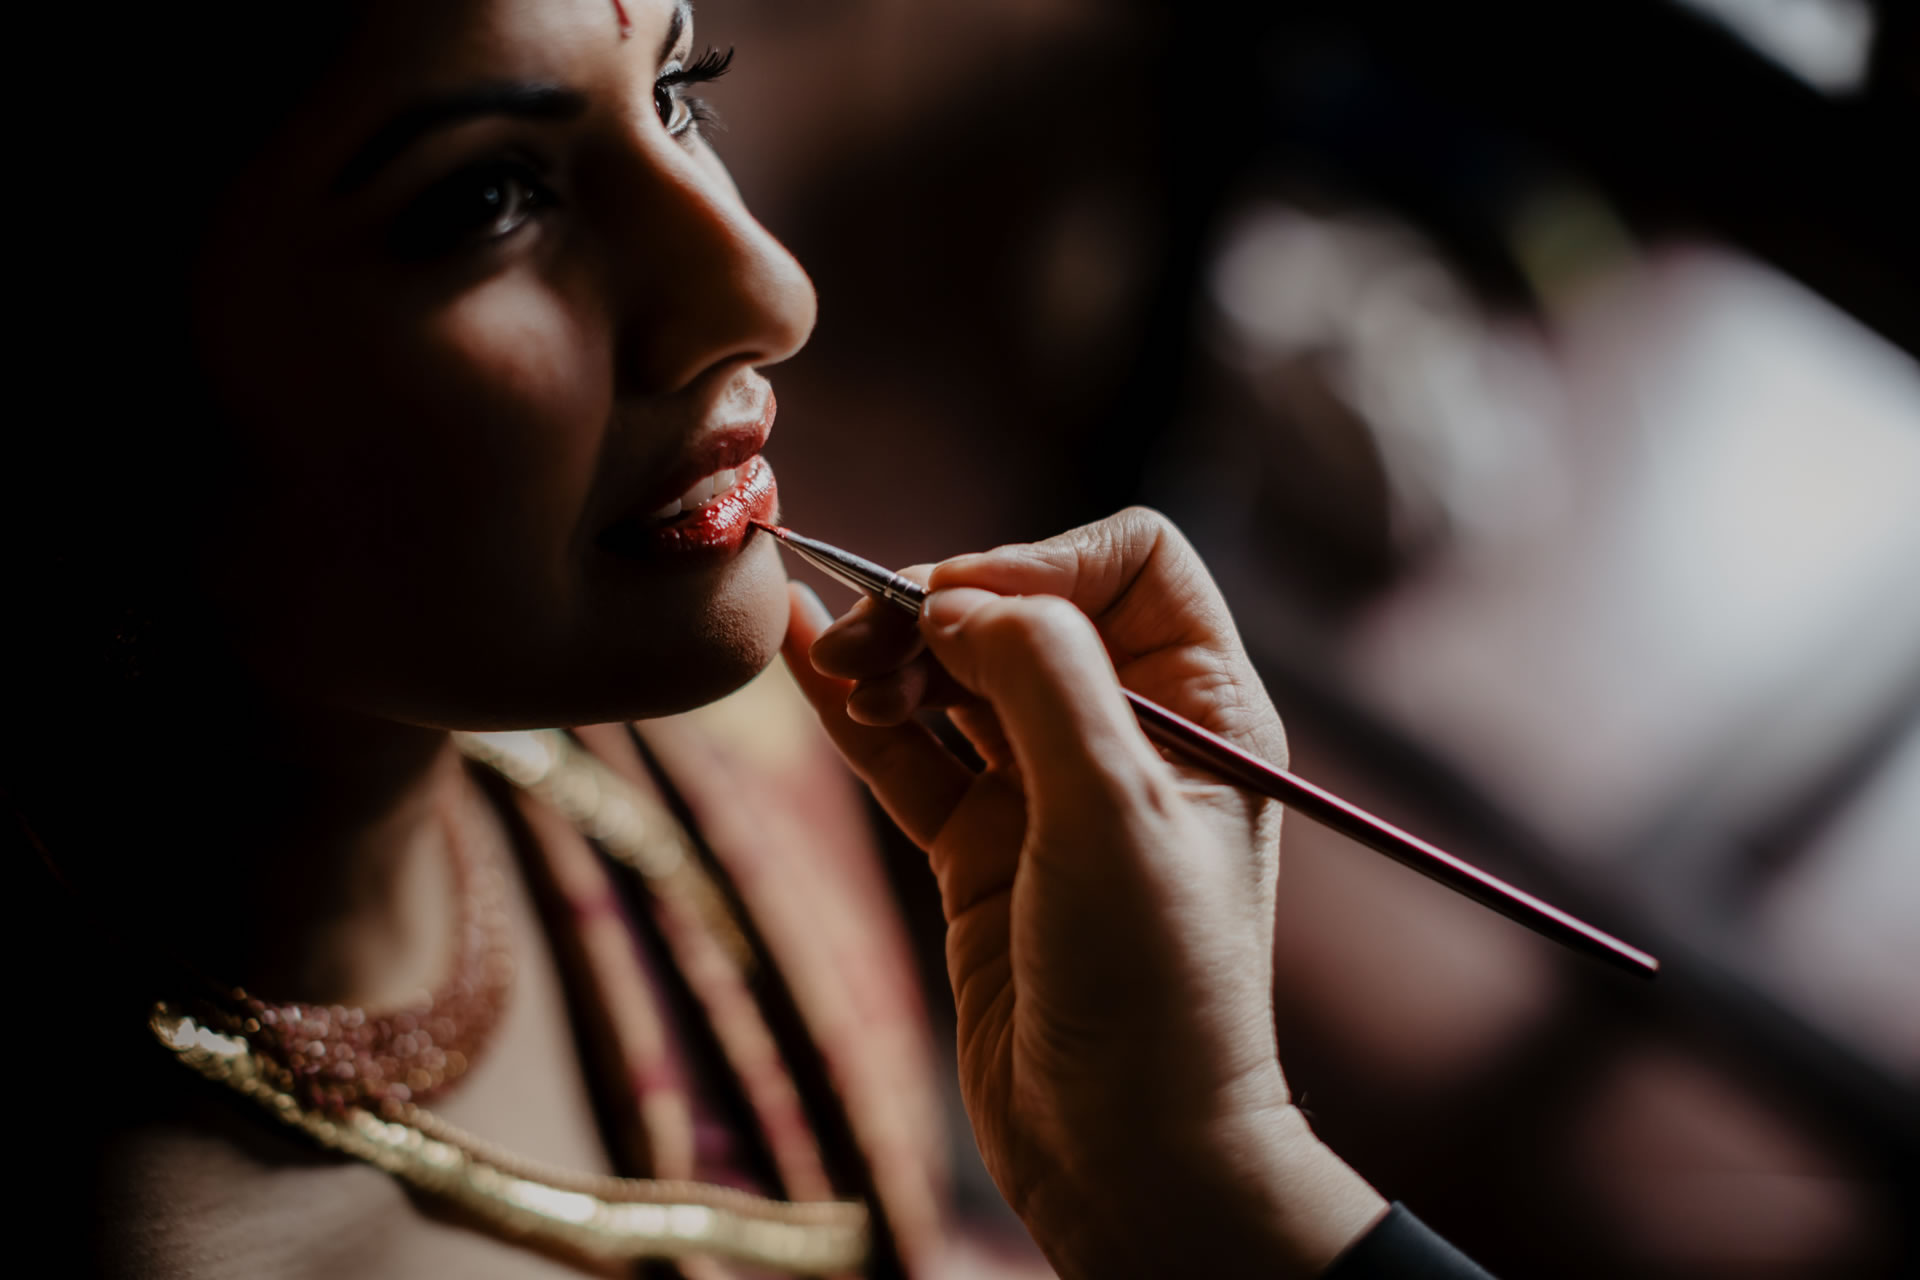 - 9 :: Indian wedding ceremony at Villa Pitiana :: Luxury wedding photography - 8 ::  - 9